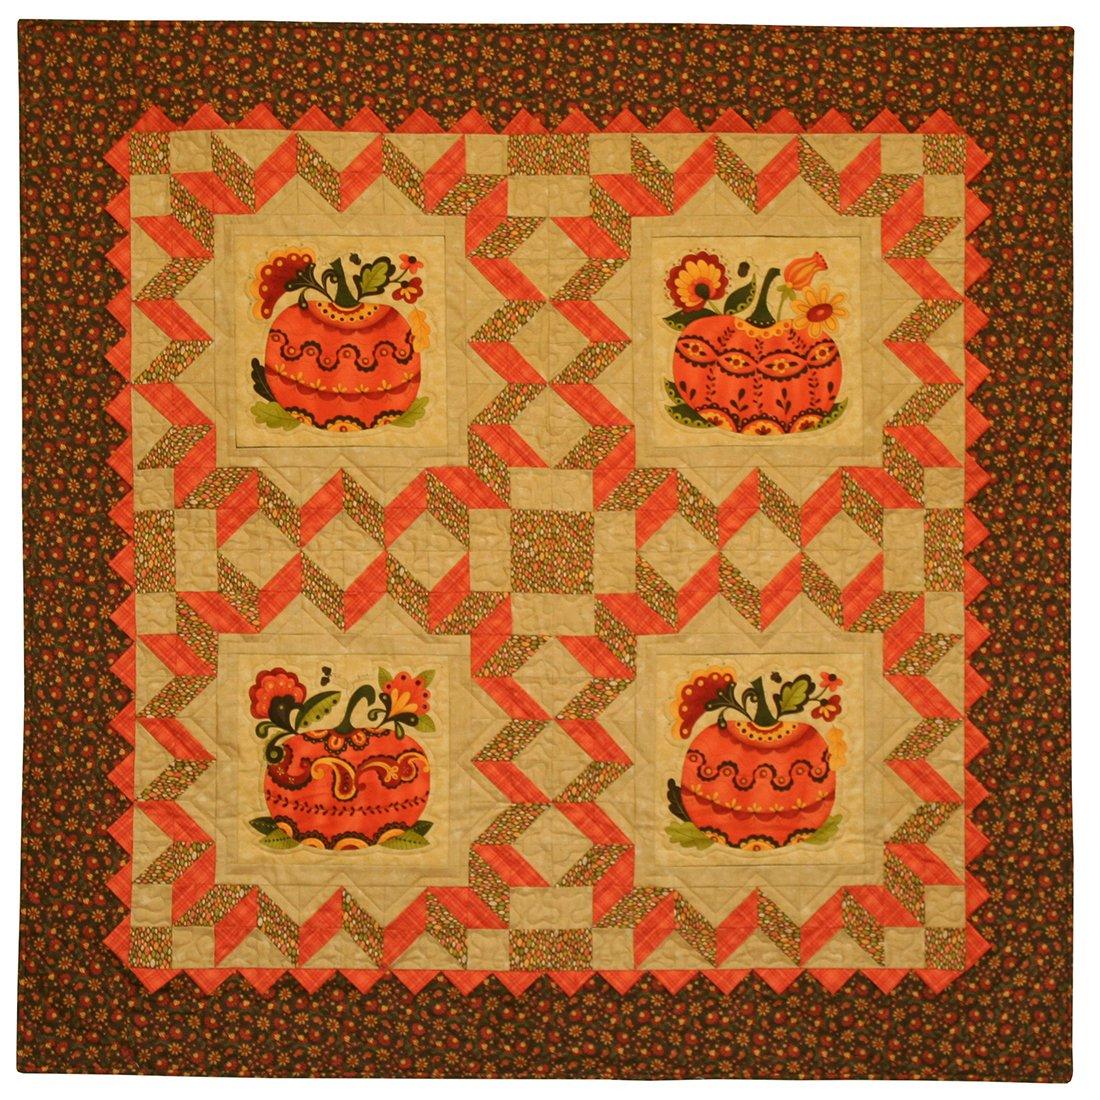 Pieces From My Heart, Sandy Gervais Posh Pumpkins Pattern #571